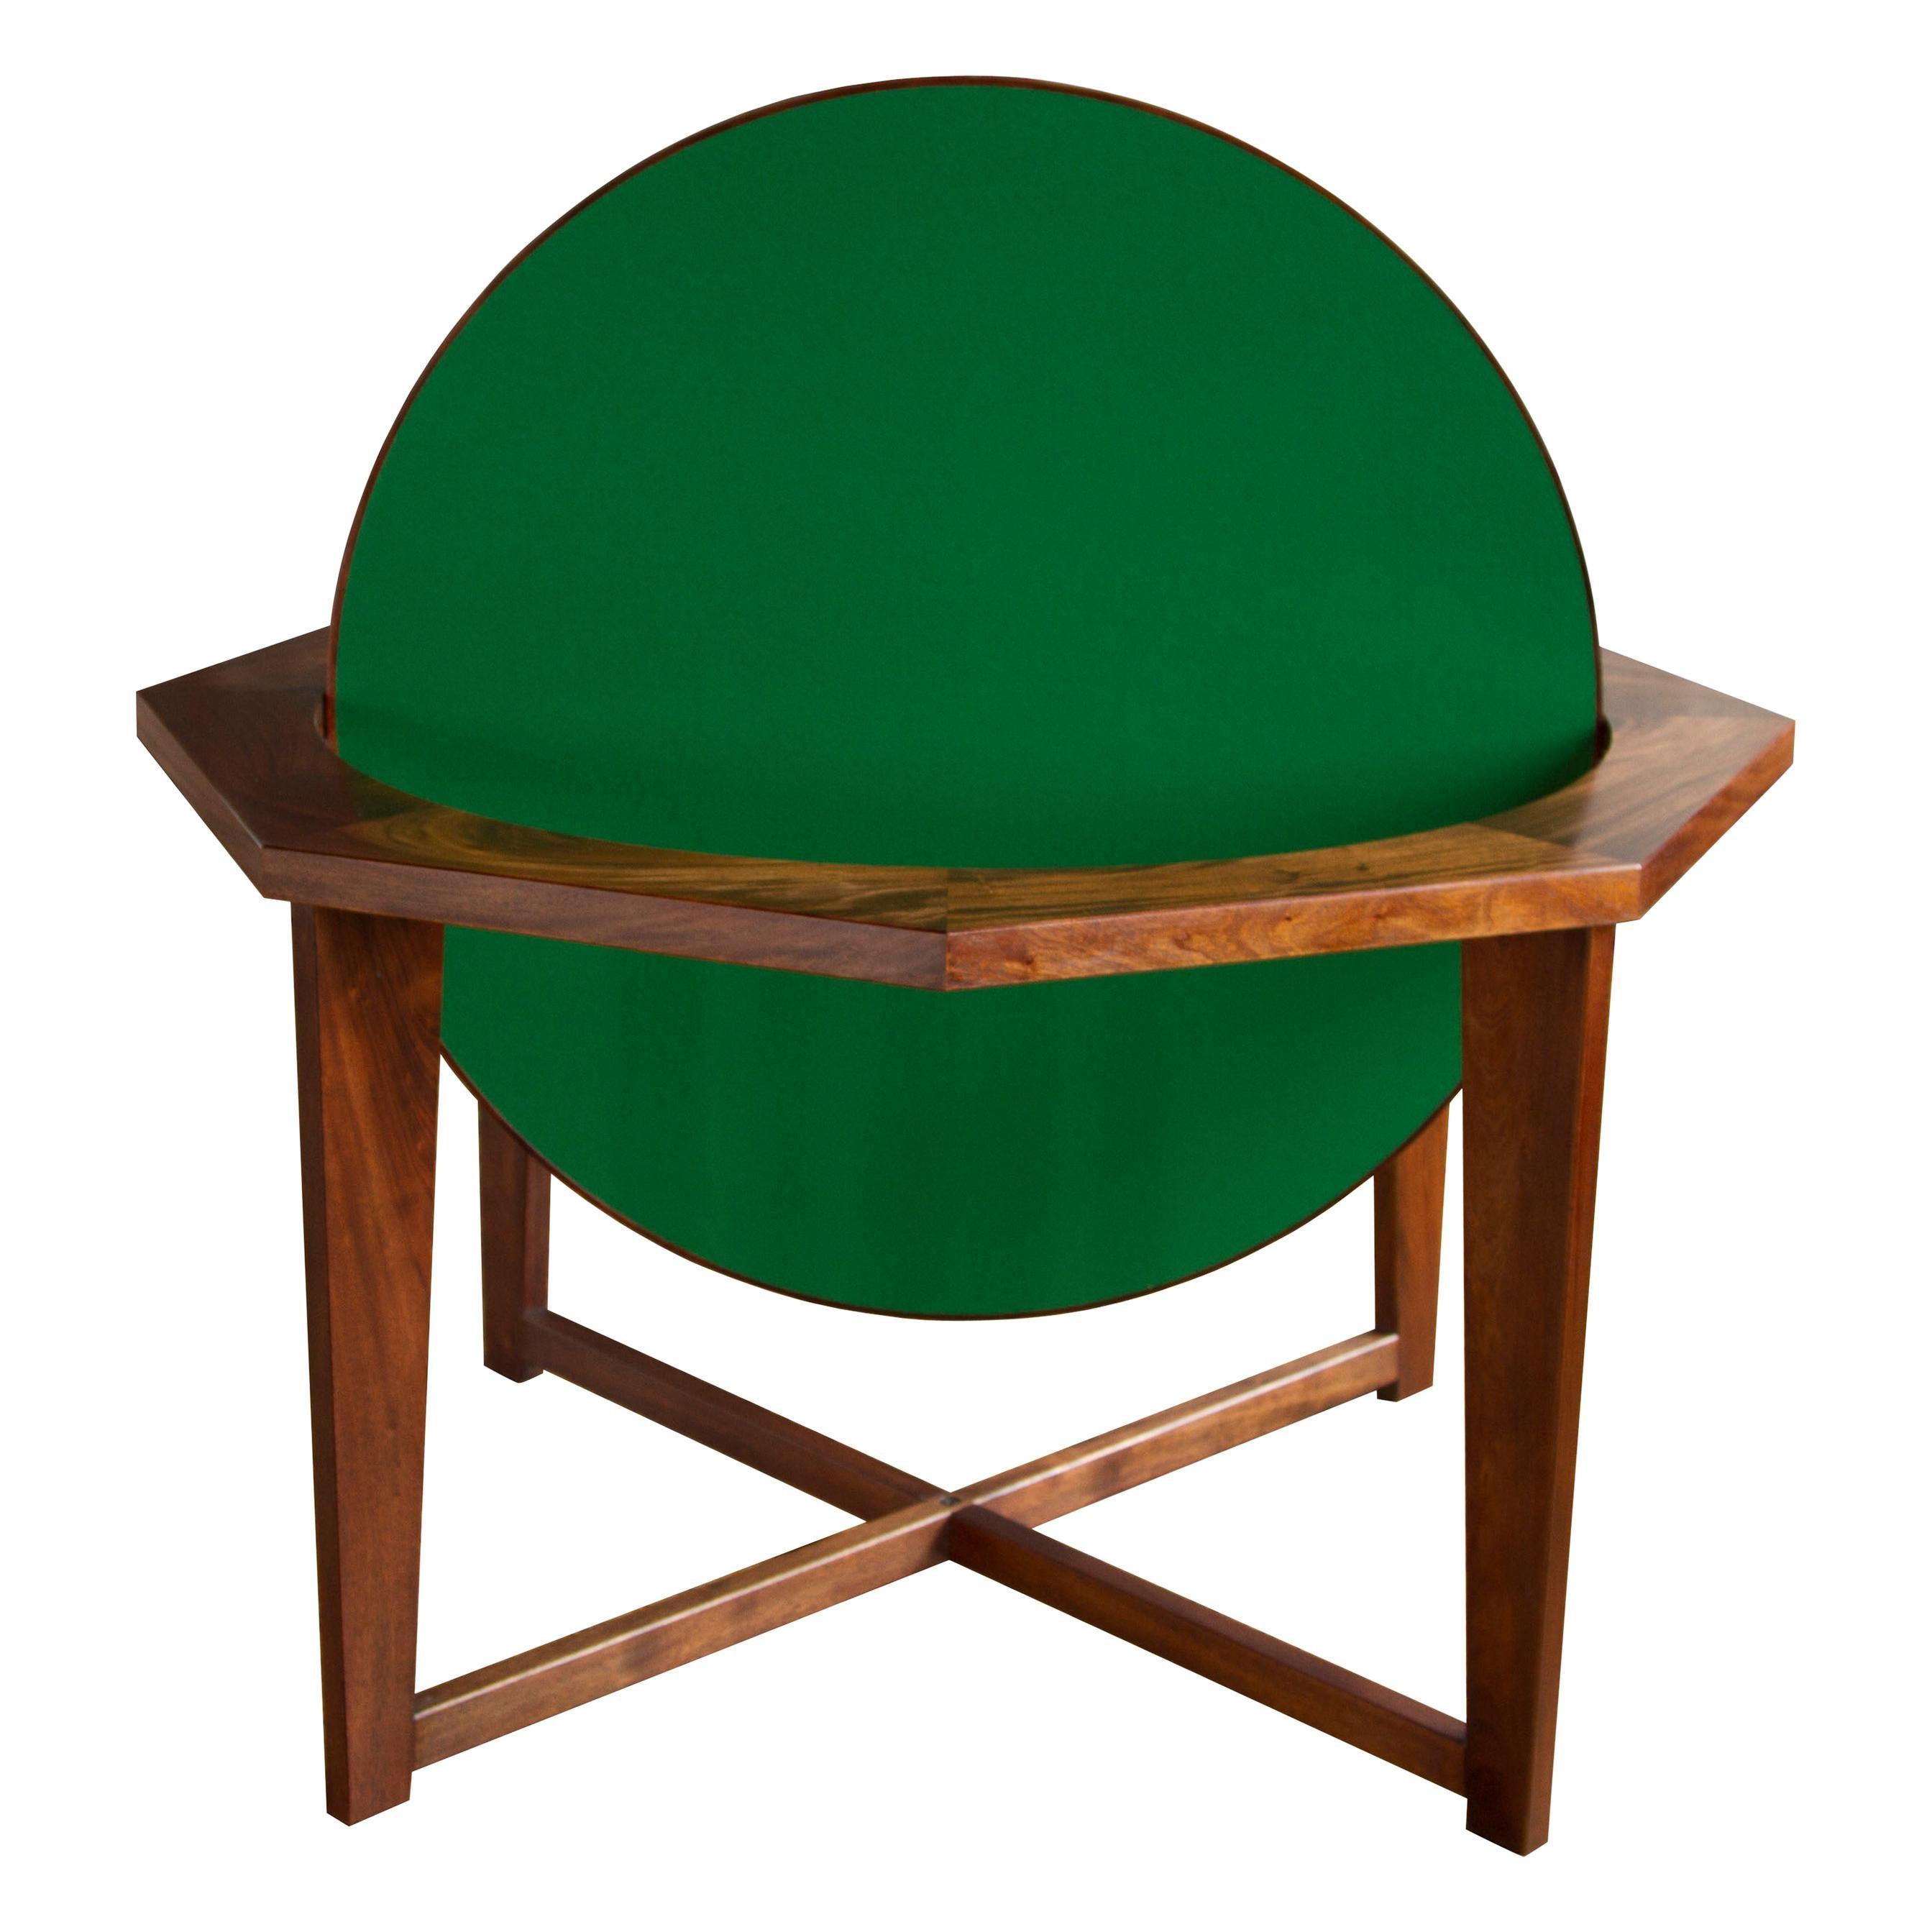 Octagonal Hendricks Dining/Poker Table- handcrafted by Richard Wrightman Design